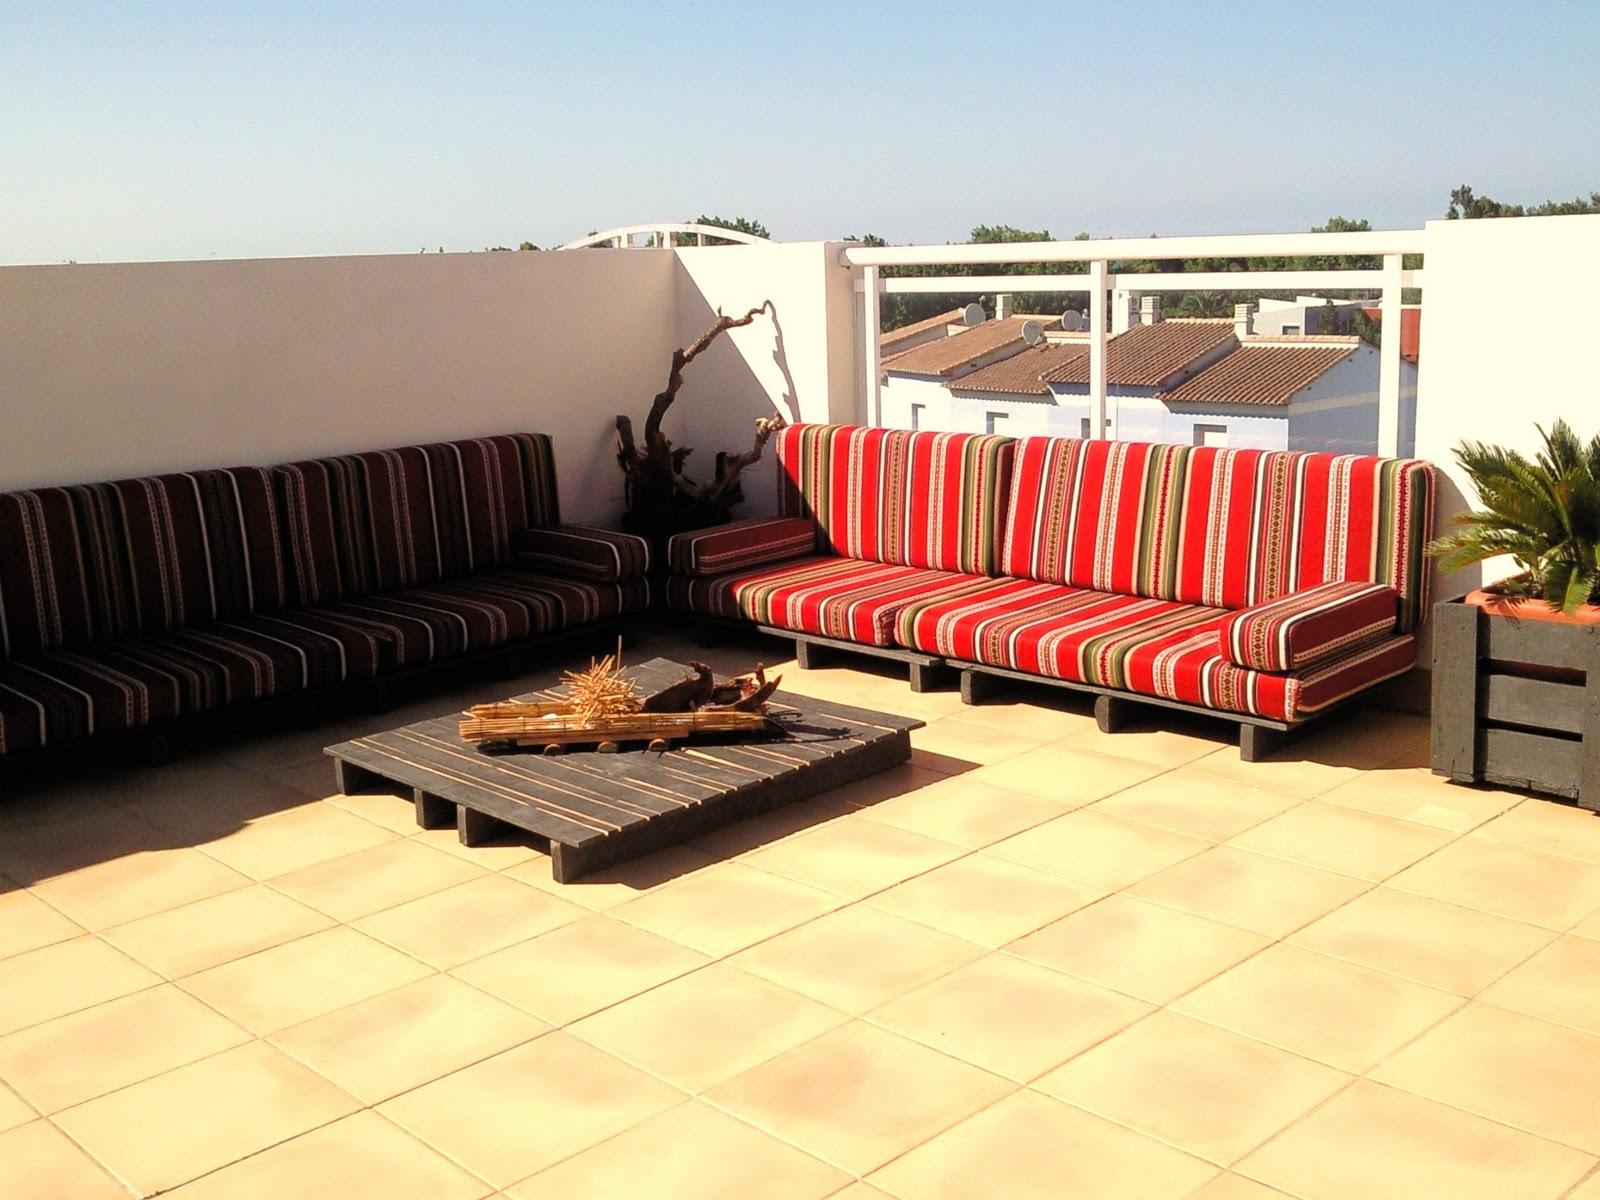 C mo hacer muebles de madera con palets madera tarimas for Muebles de terraza con palets